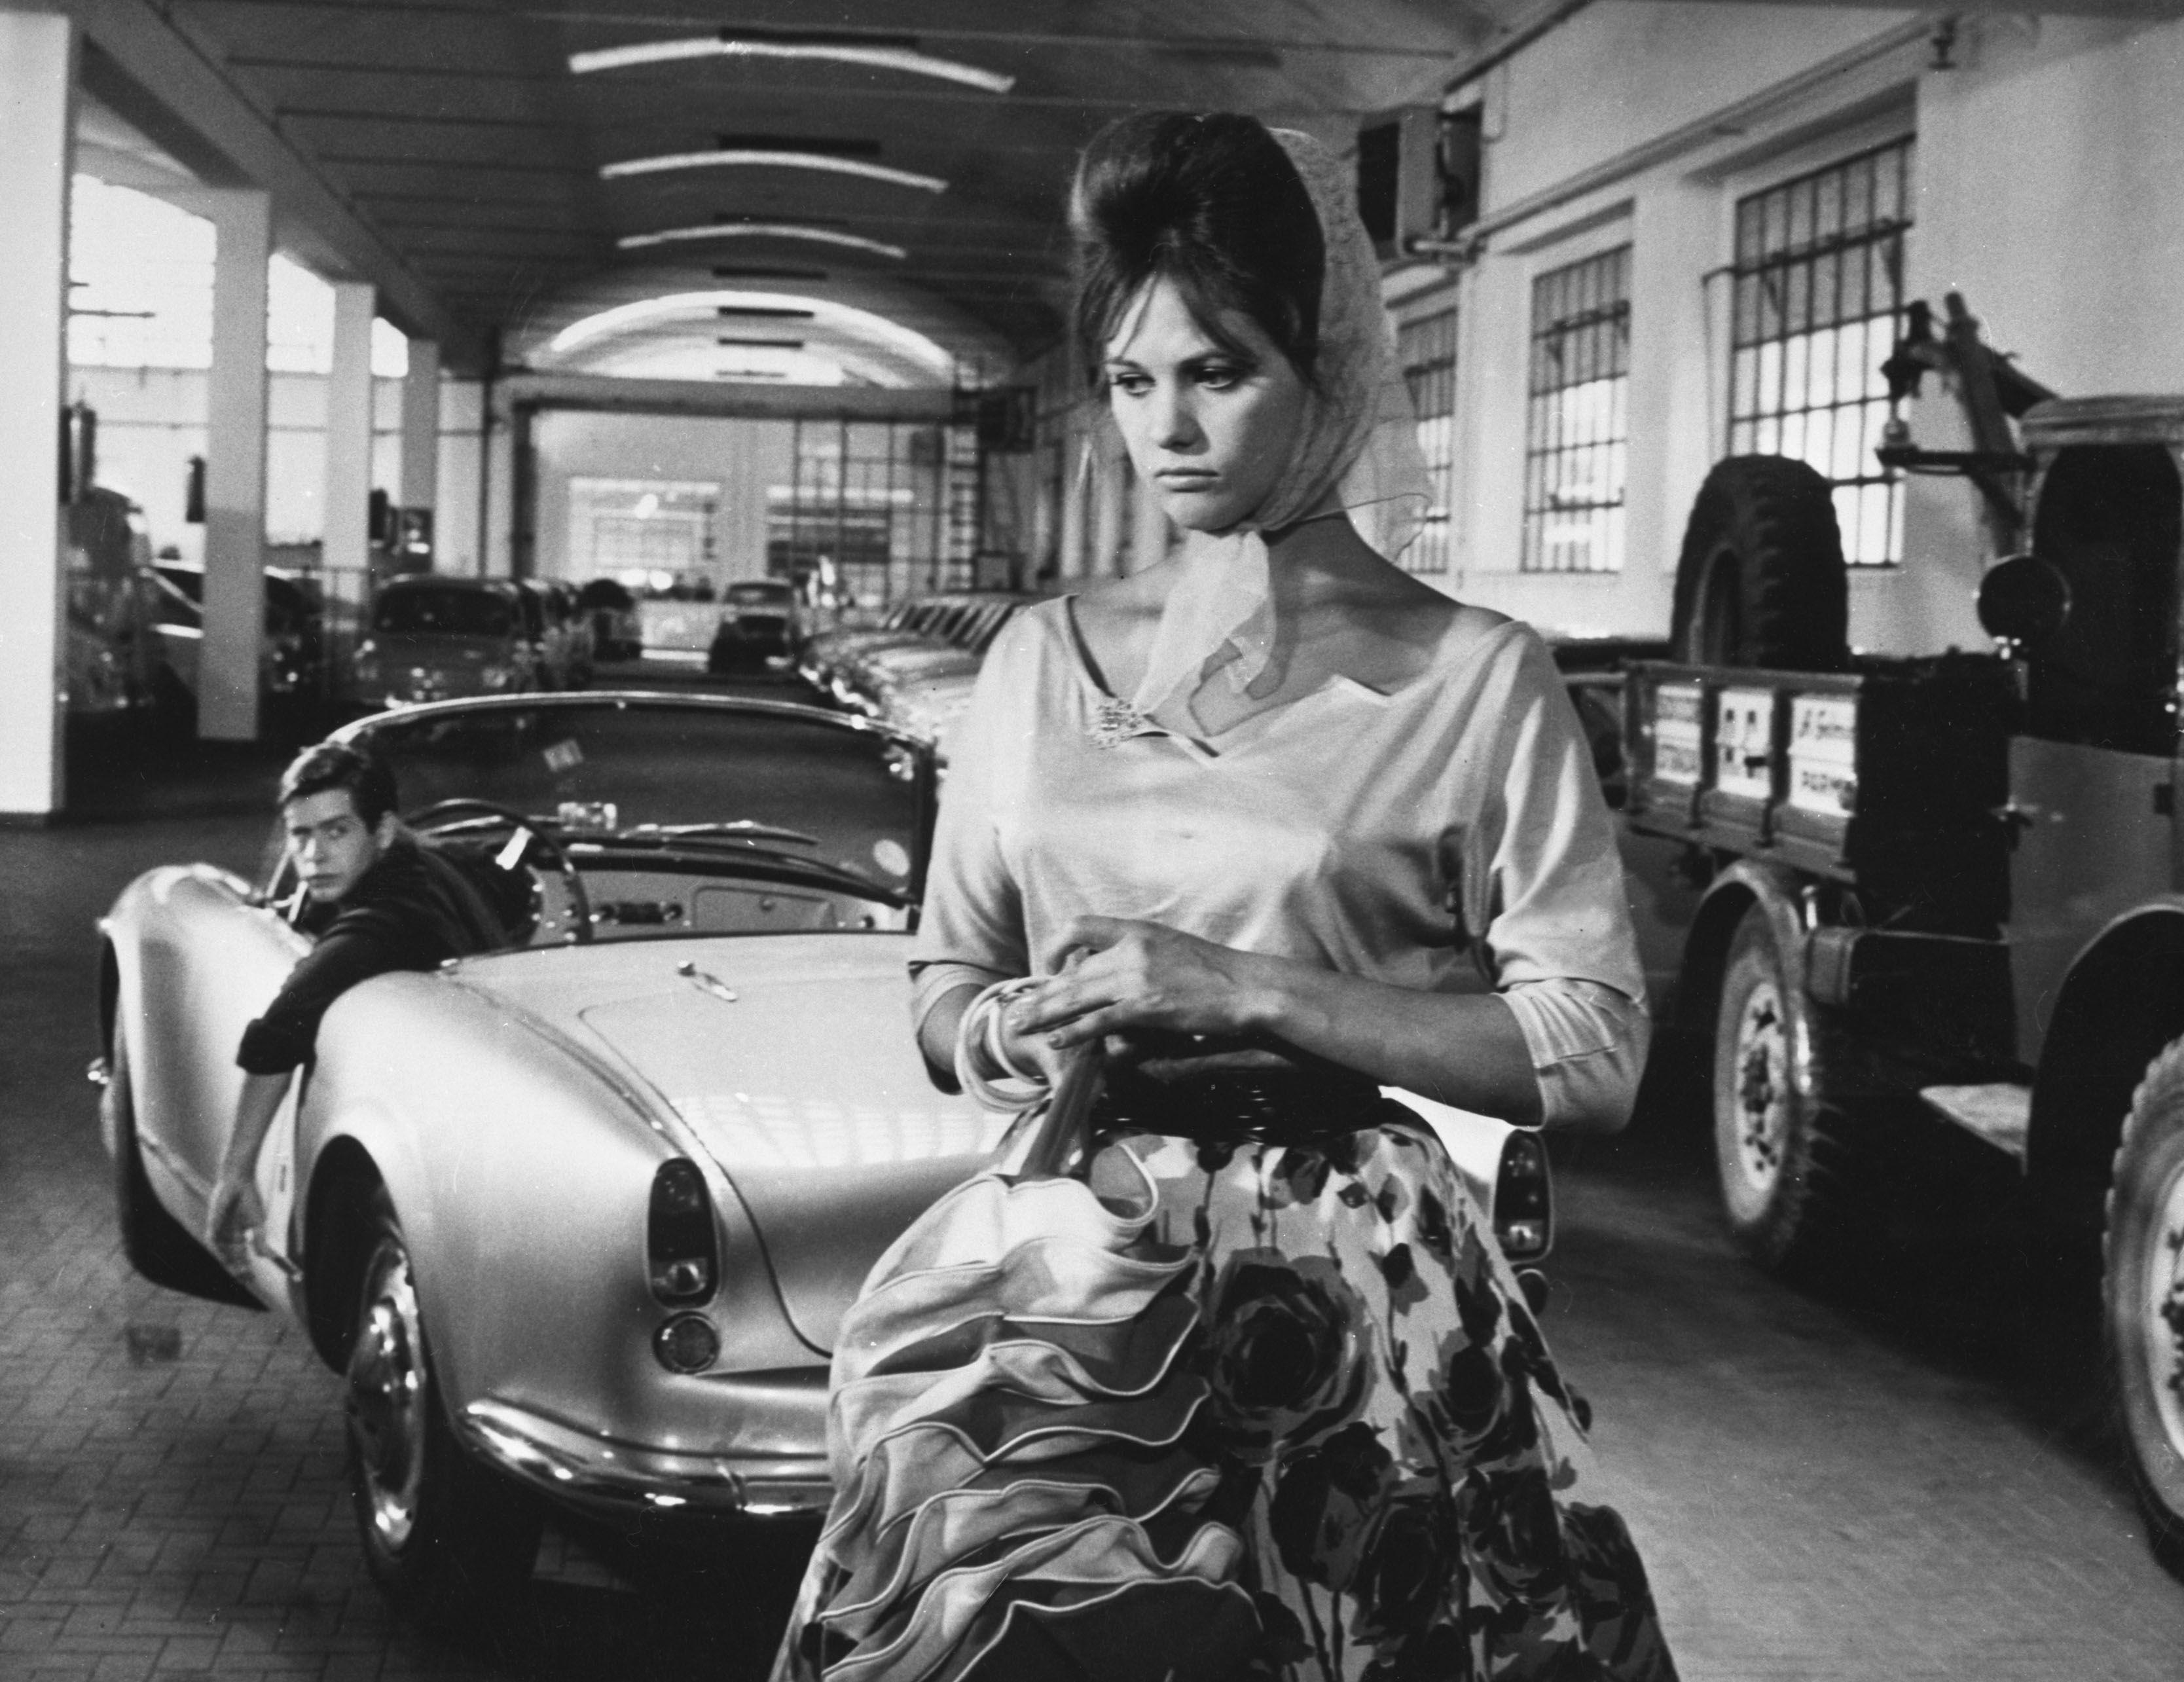 """A Moça com a Valise"" (La Ragazza con la Valigia), Itália/França, 1961, dirigido por Valerio Zurlini."